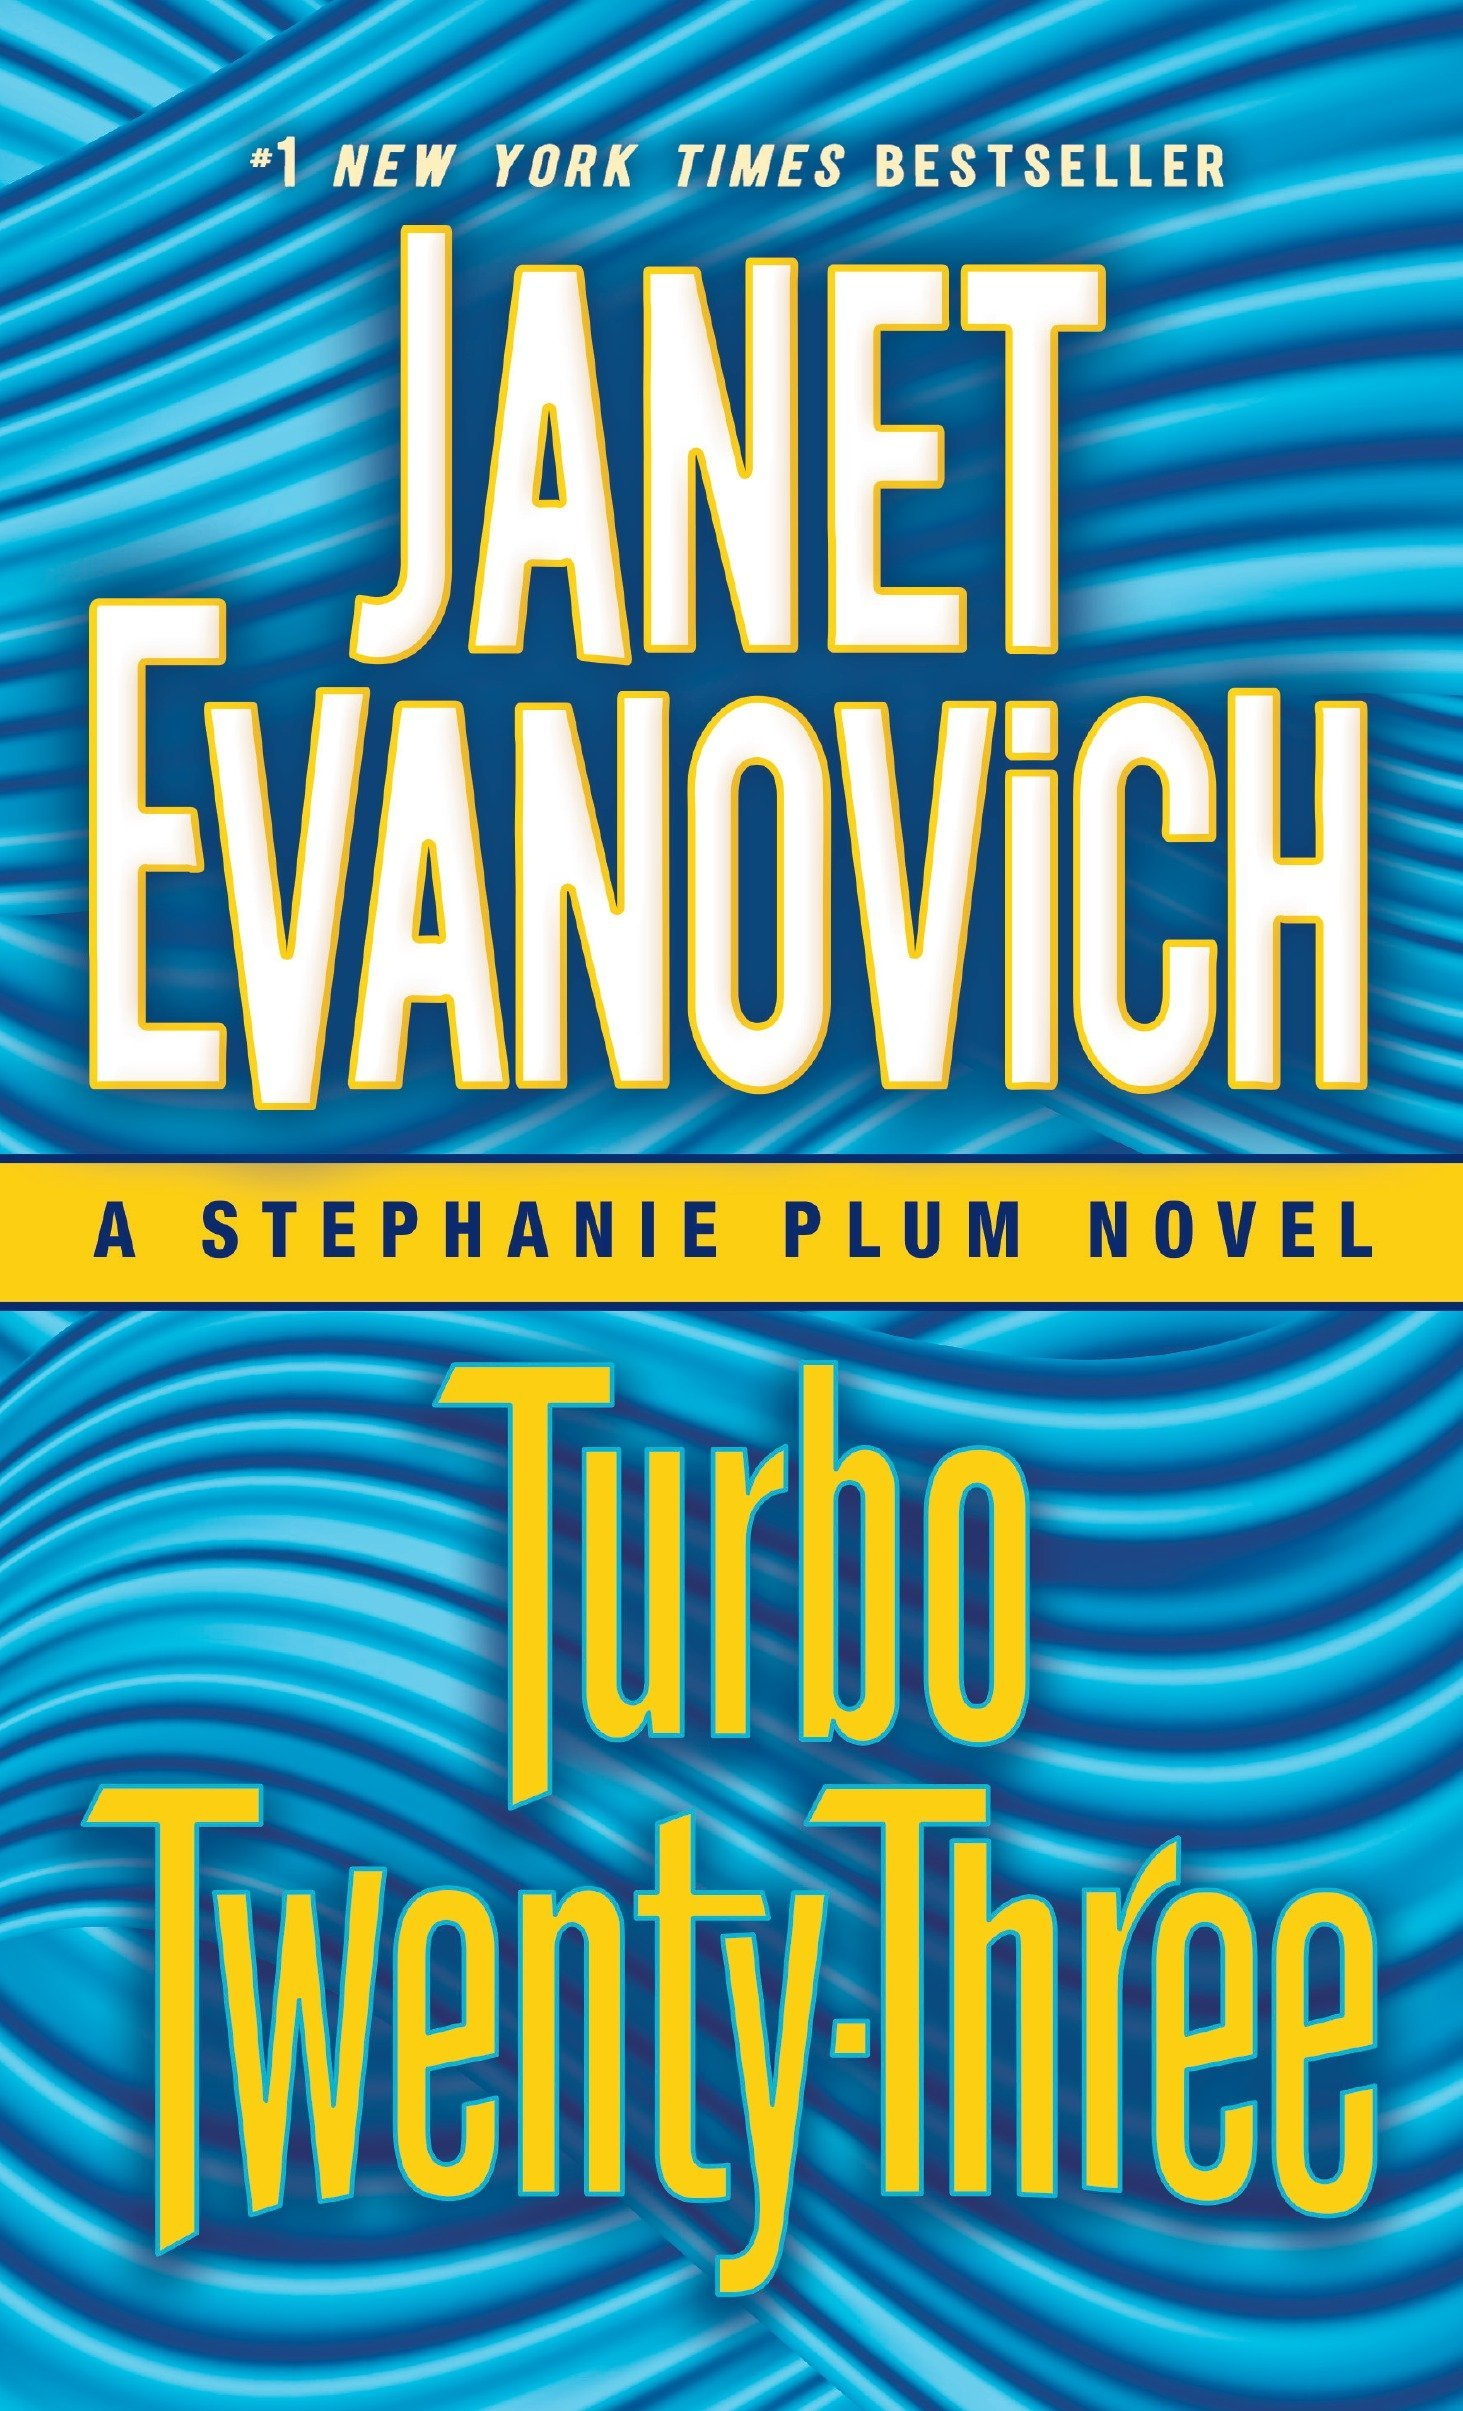 Turbo Twenty - Three (Stephanie Plum): Amazon.es: Evanovich Janet: Libros en idiomas extranjeros